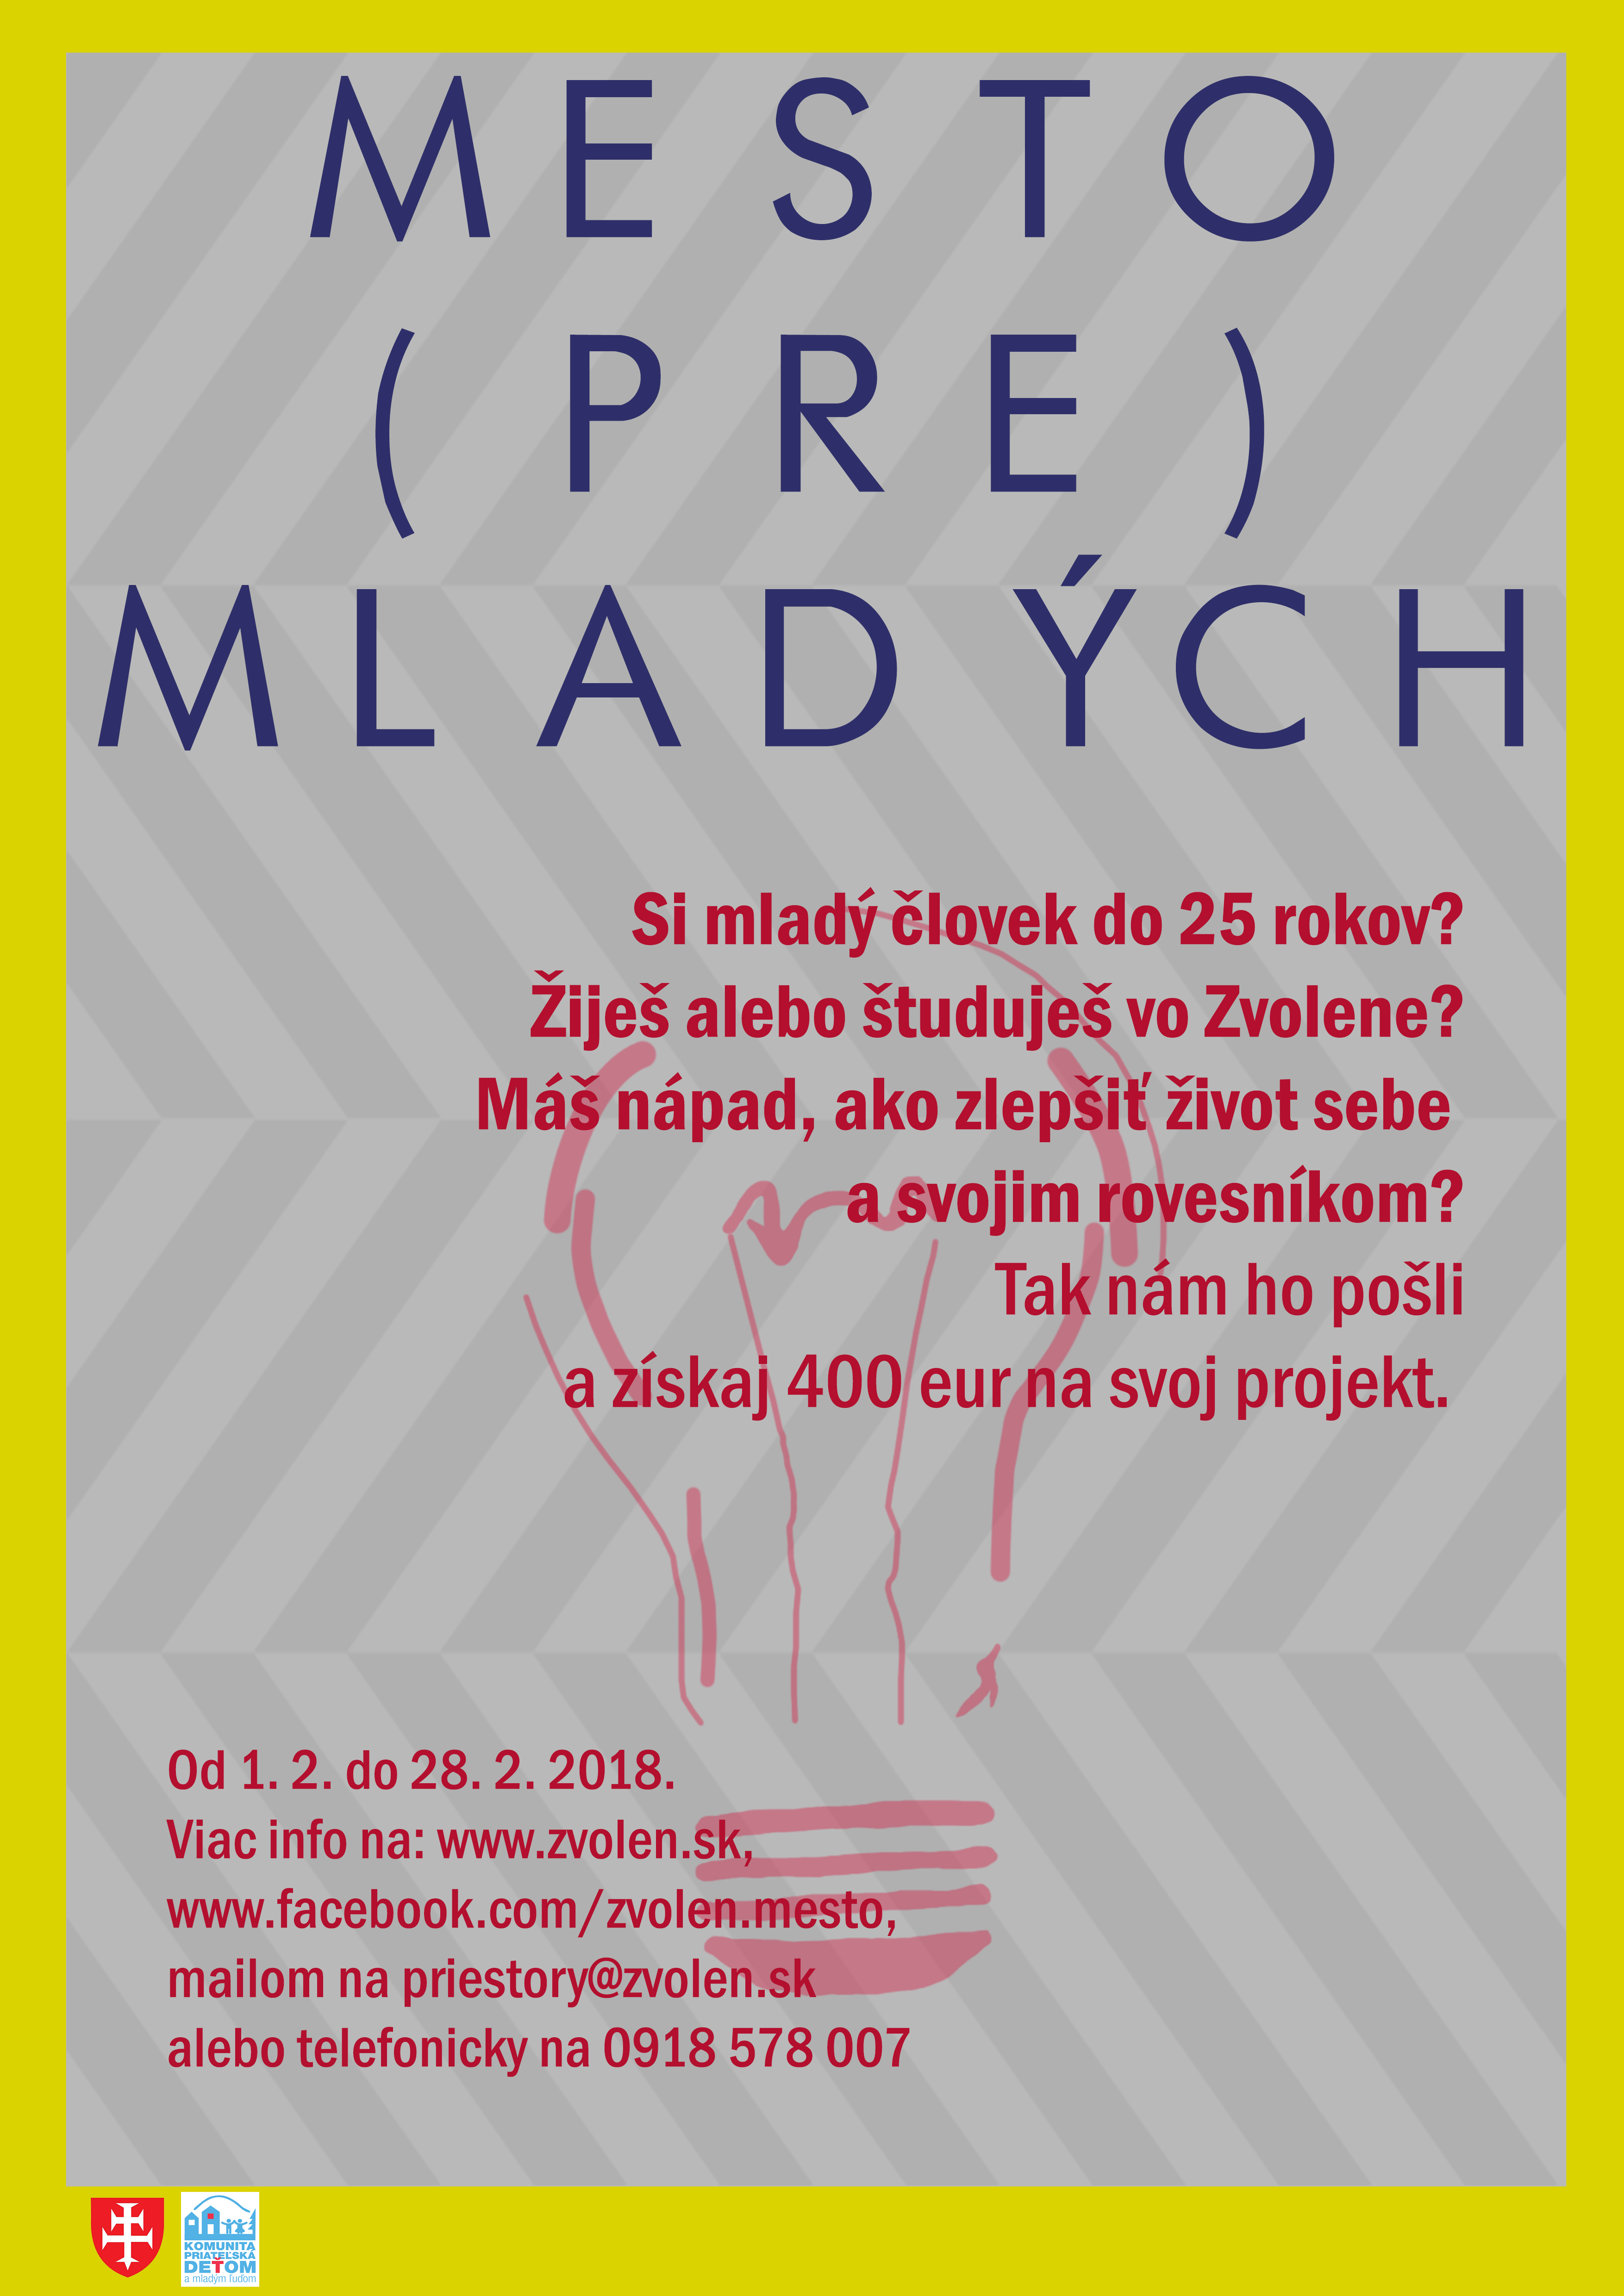 mesto pre-mladych-plagat-2018